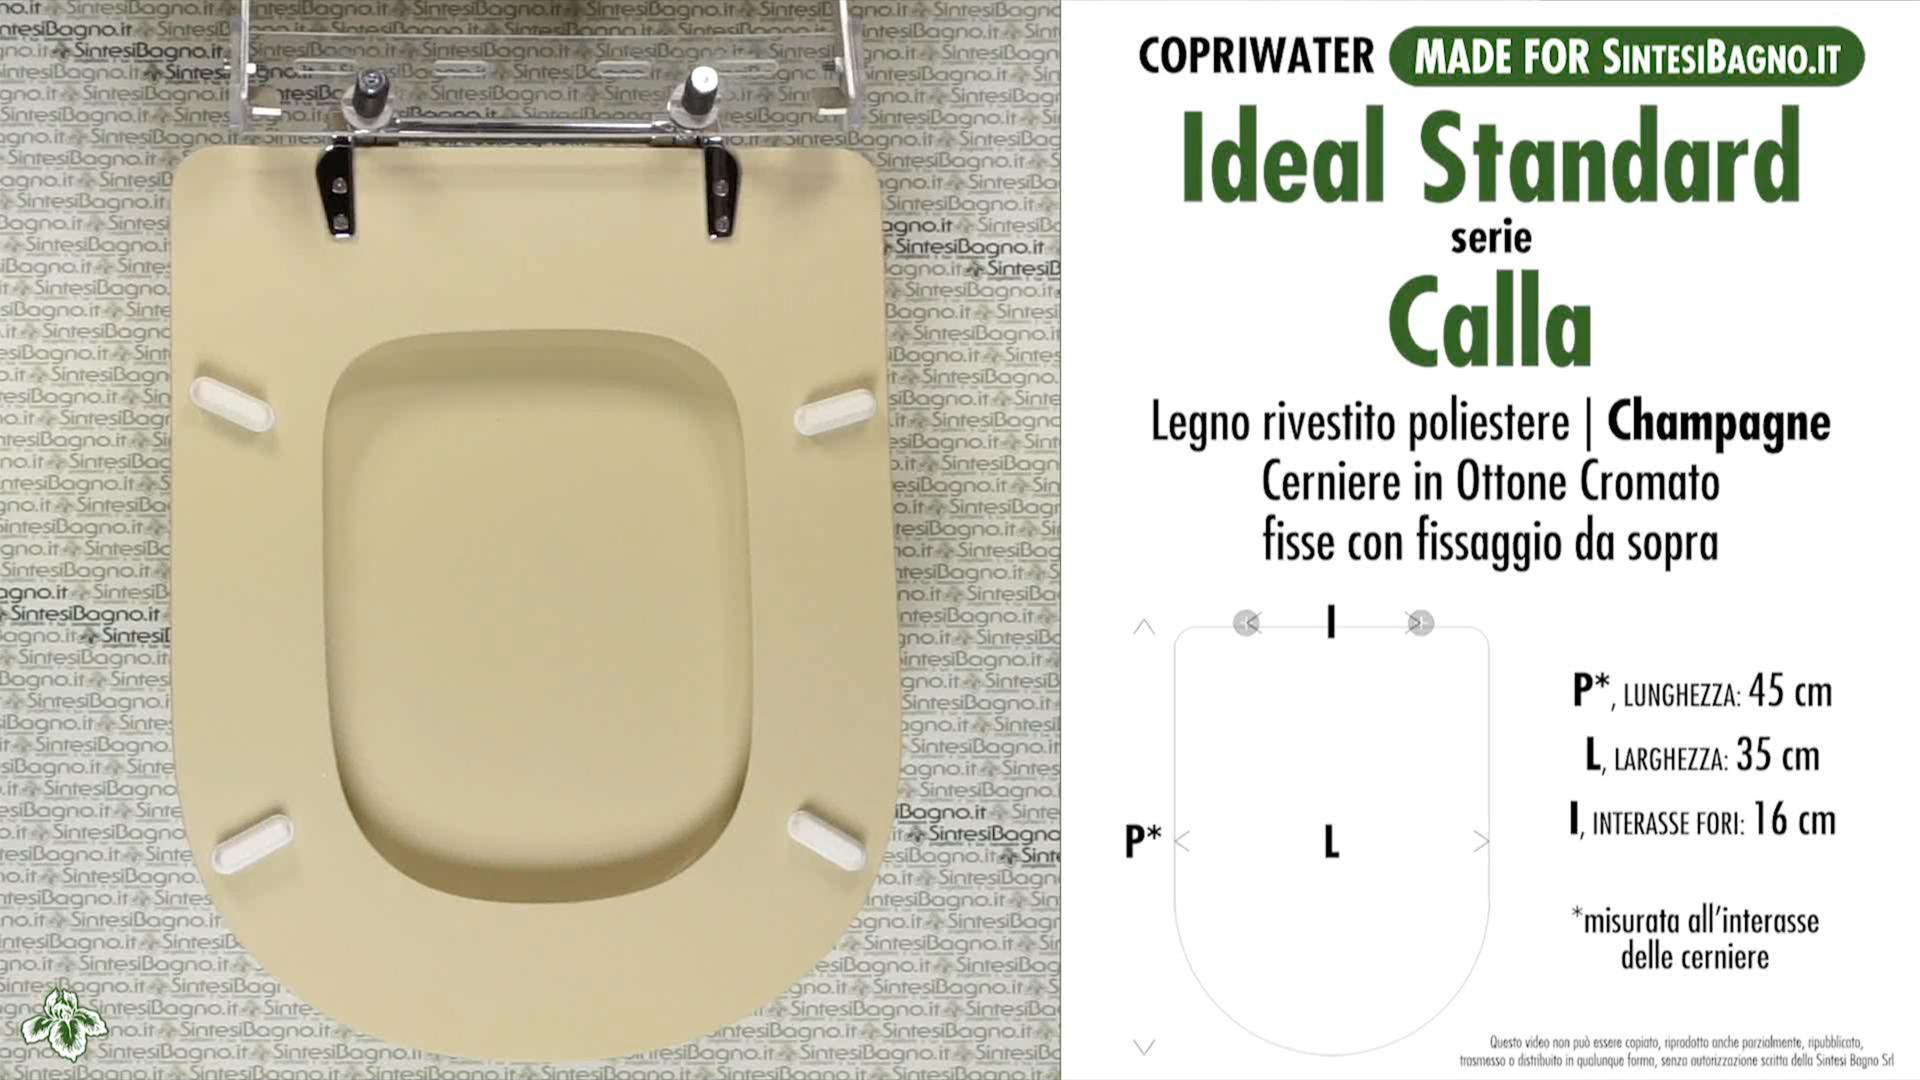 Copriwater per wc calla ideal standard champagne for Copriwater ideal standard